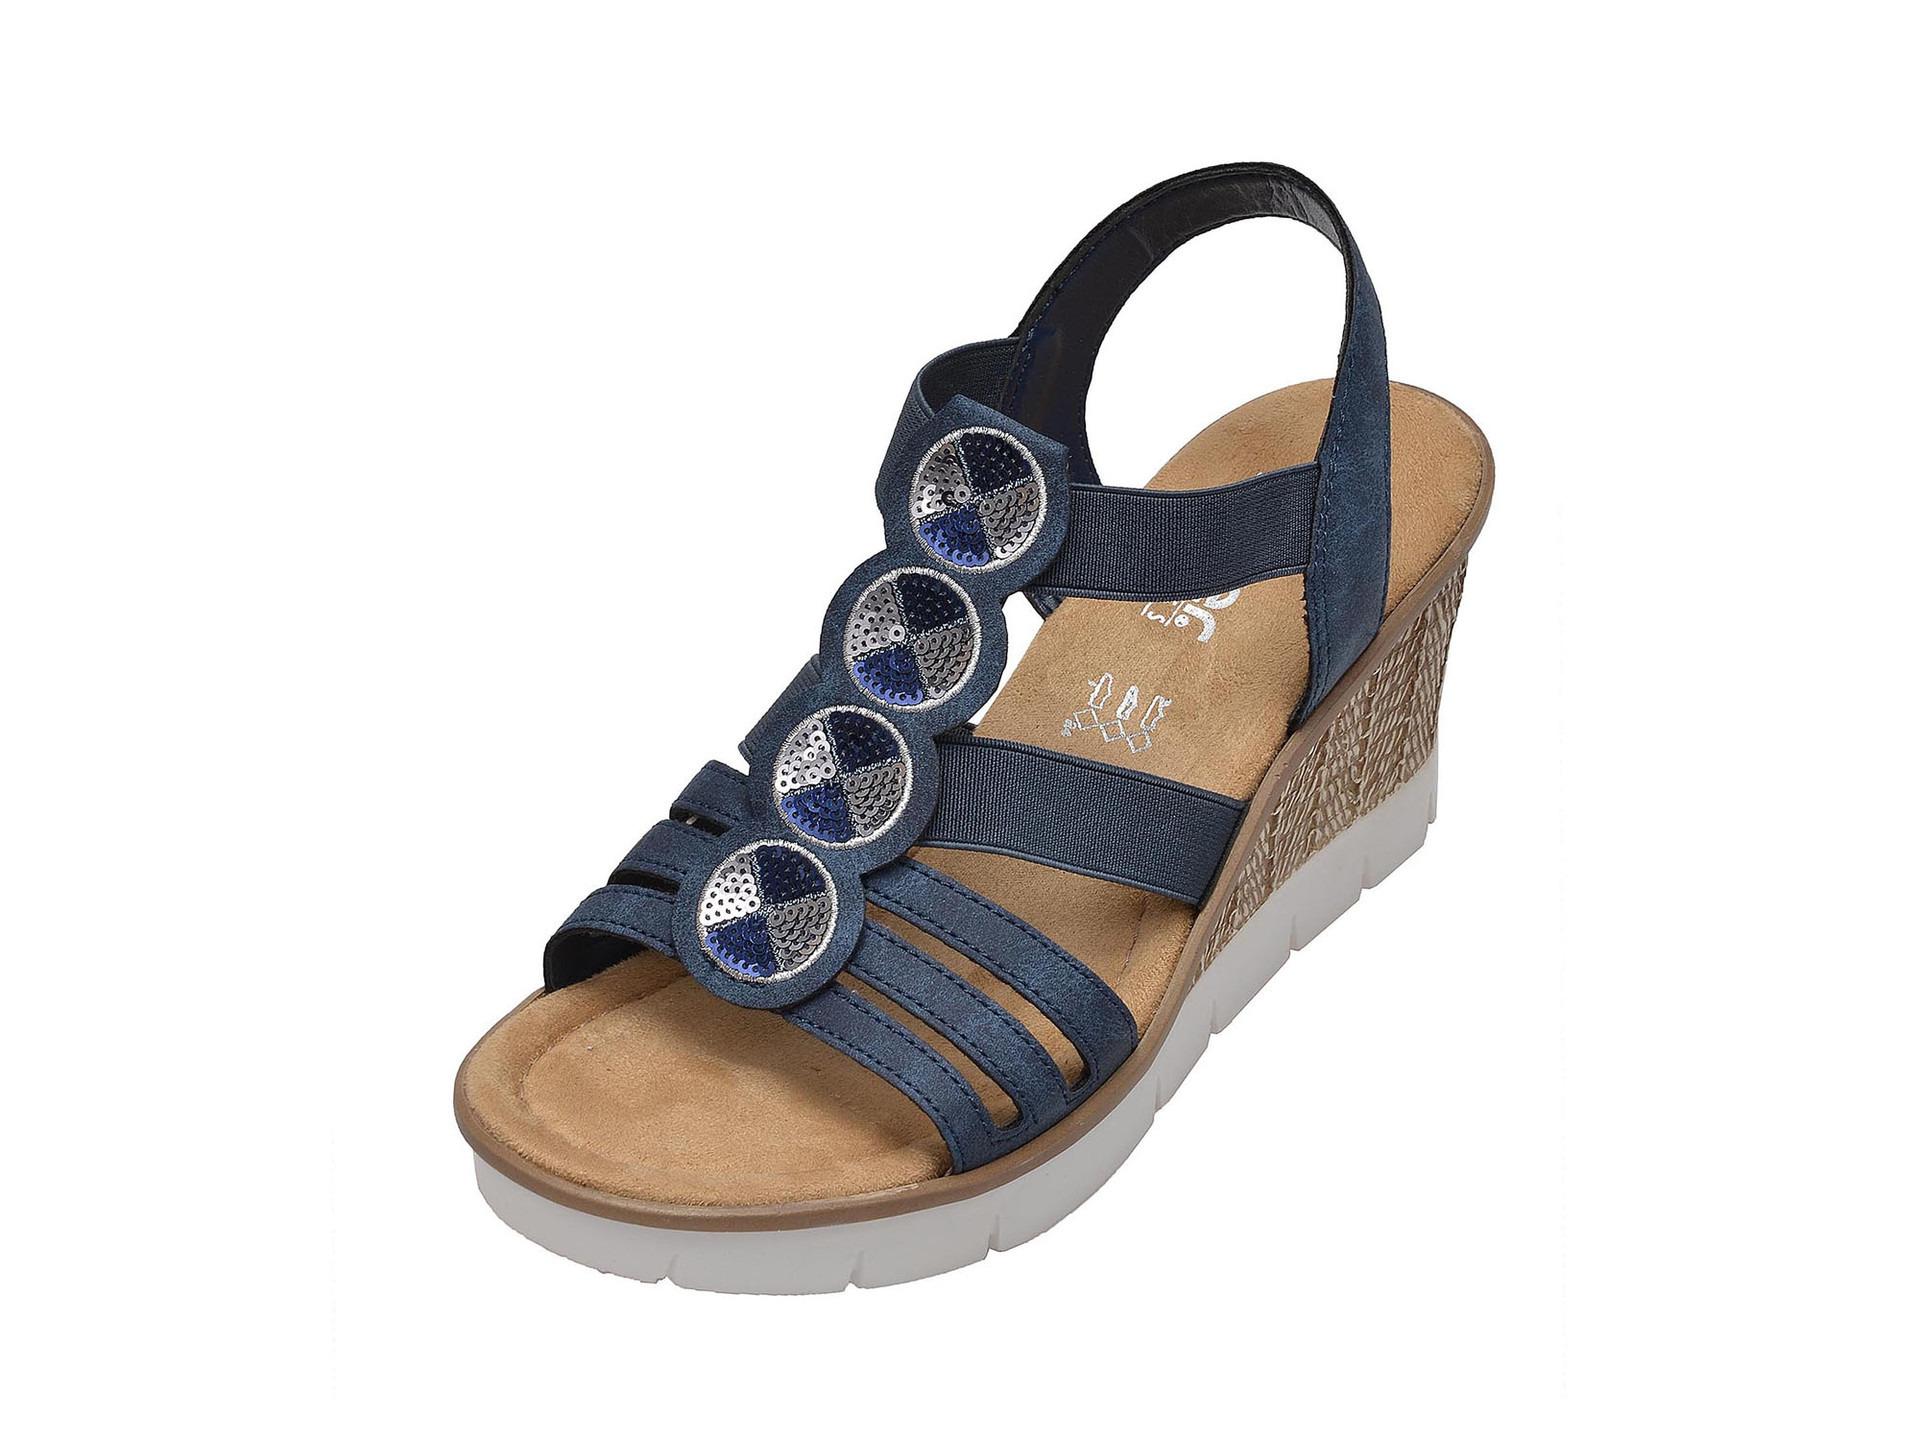 0acd77b8eb124 Soňa - Dámska obuv - Sandále - Modré dámske otvorené sandále na ...